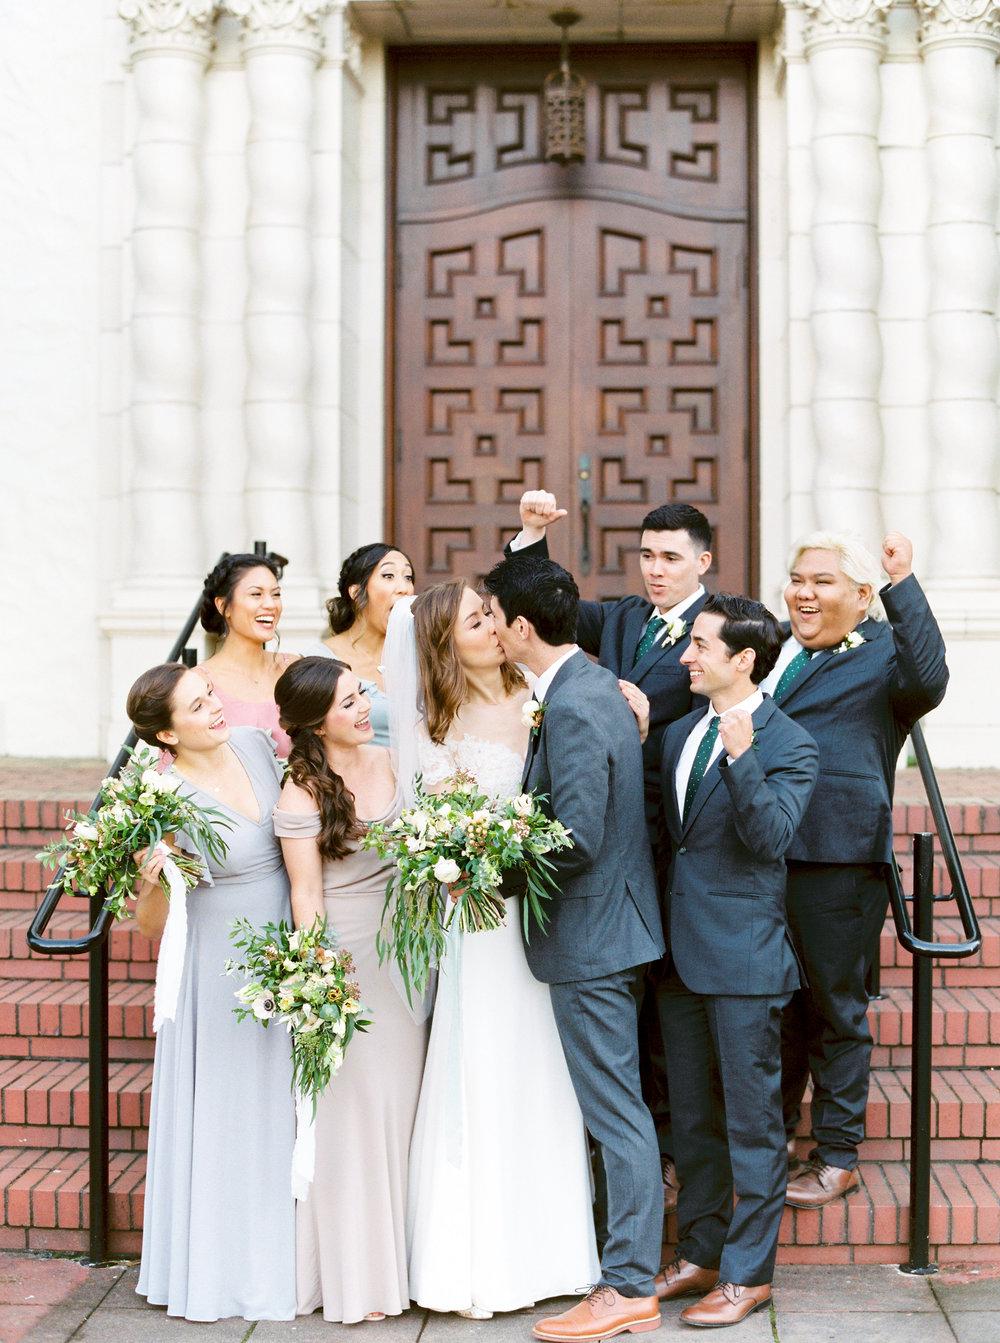 Log-cabin-wedding-in-presidio-san-francisco-california-desintation-wedding-photography-116.jpg